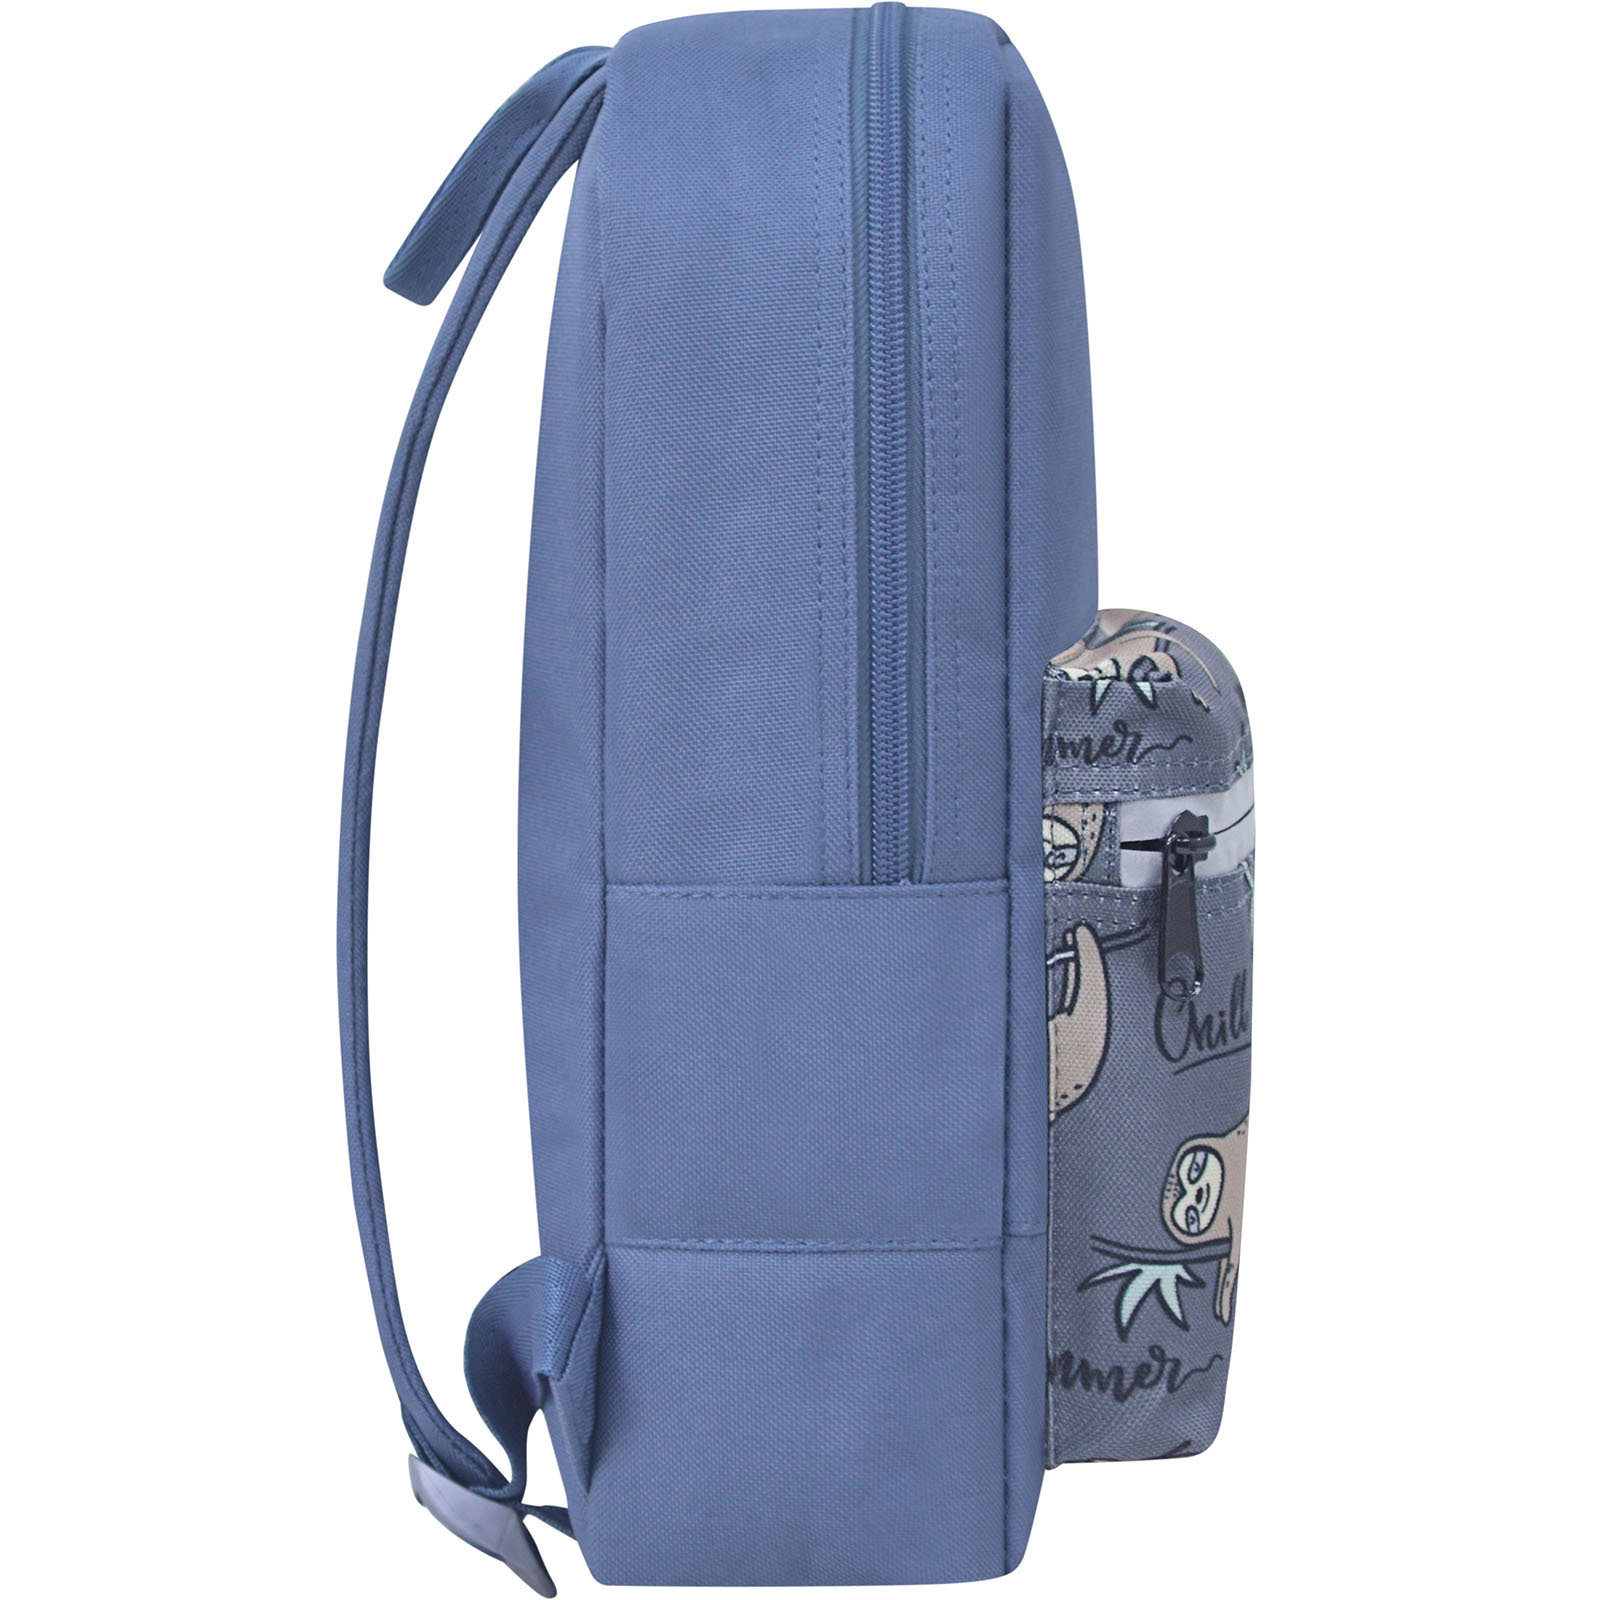 Рюкзак Bagland Молодежный mini 8 л. серый 769 (0050866)